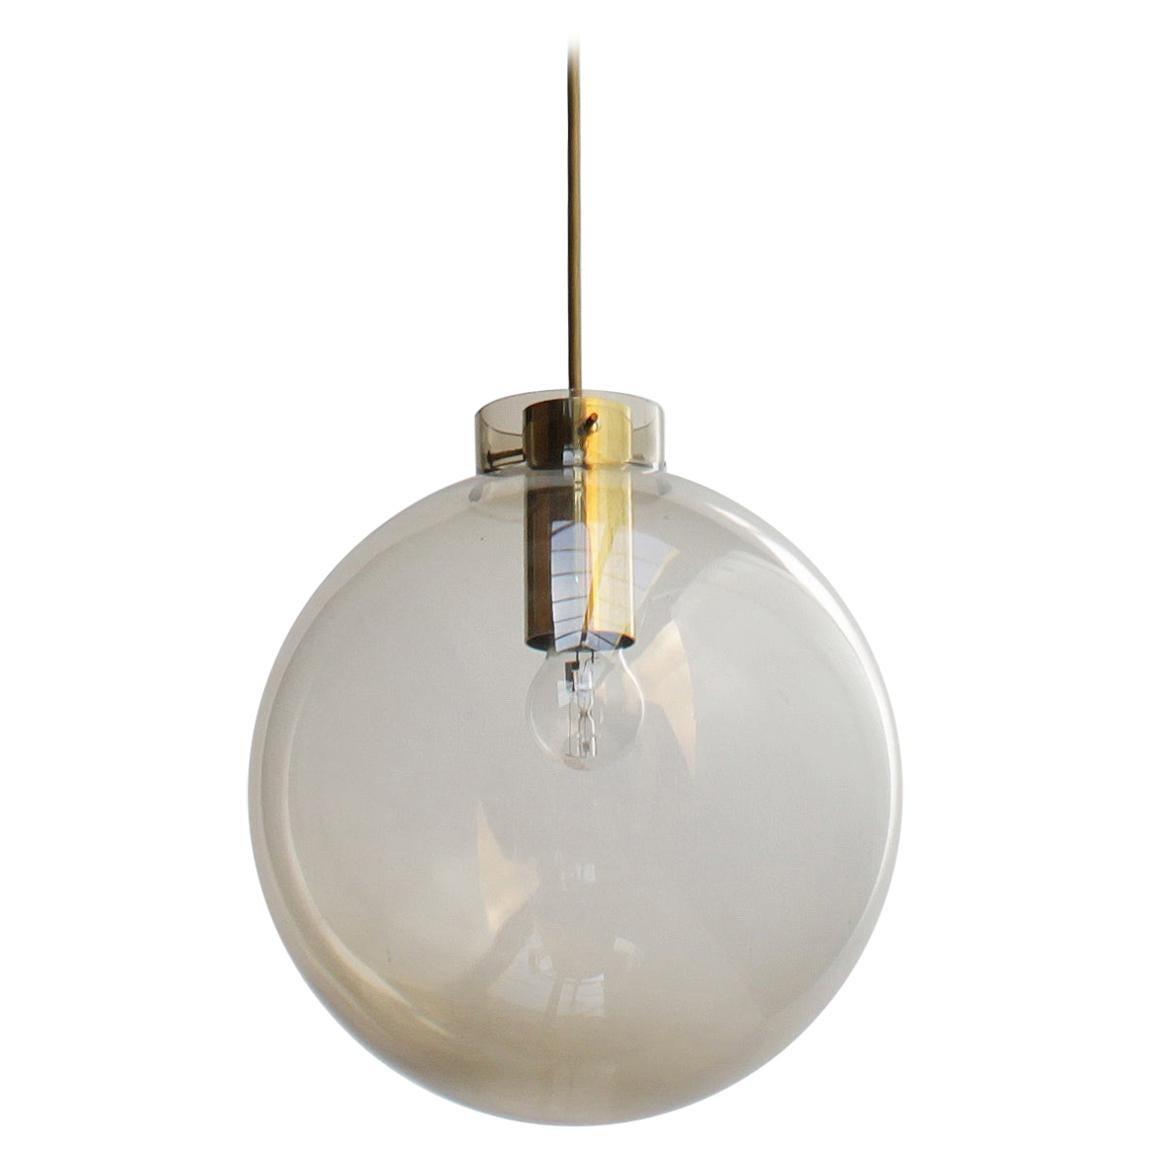 Scandinavian Glass Sphere Pendant by Jonas Hidle for Høvik Lys